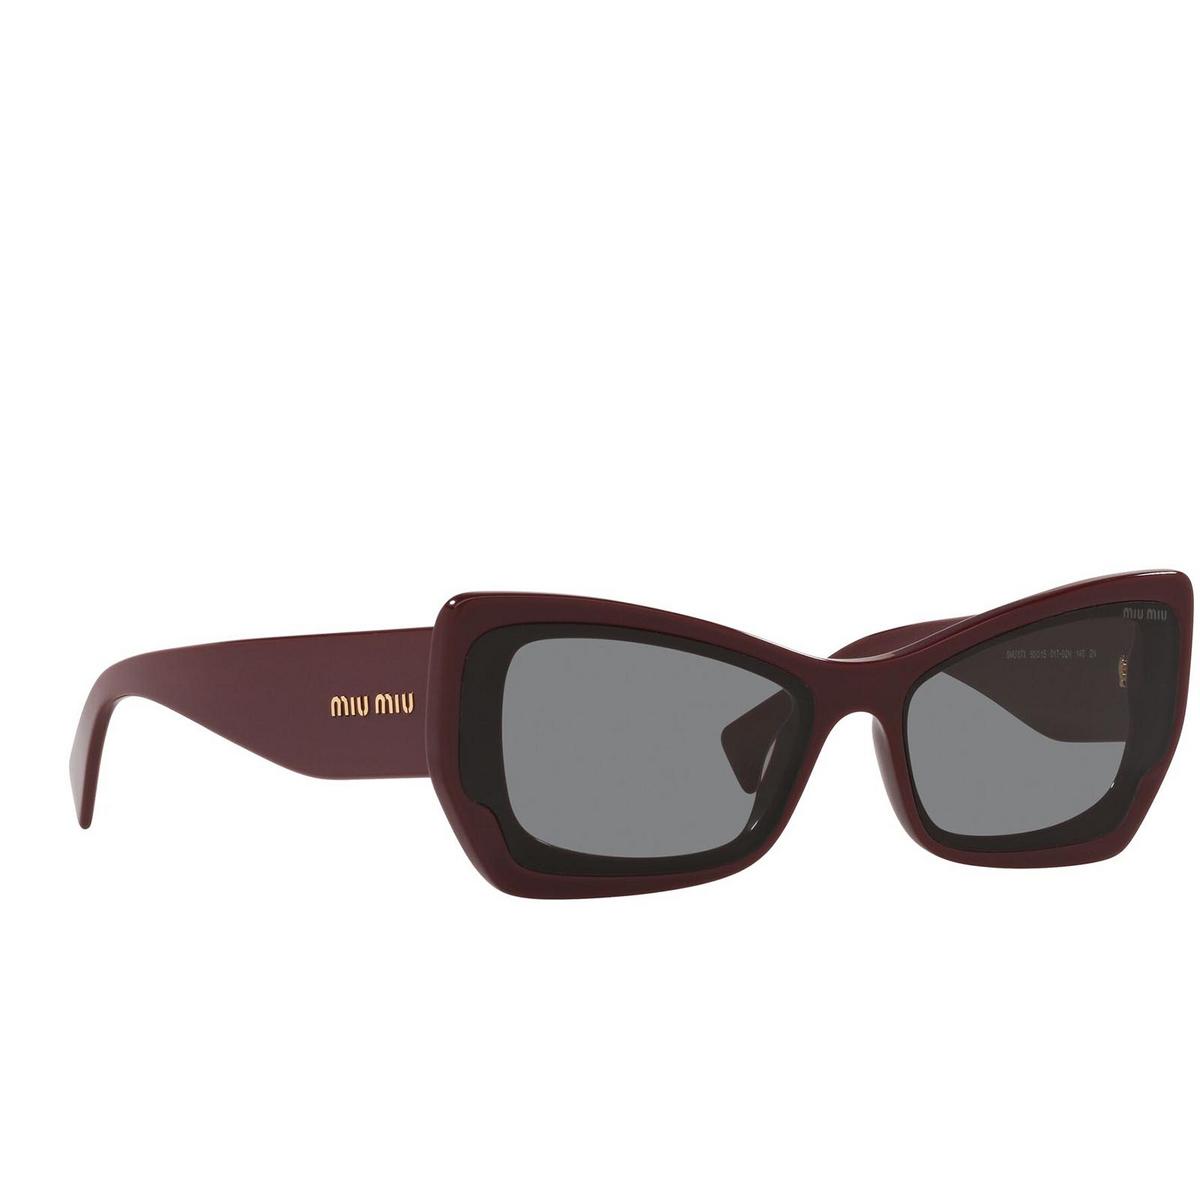 Miu Miu® Irregular Sunglasses: MU 07XS color Pink Bordeaux 01T02N.